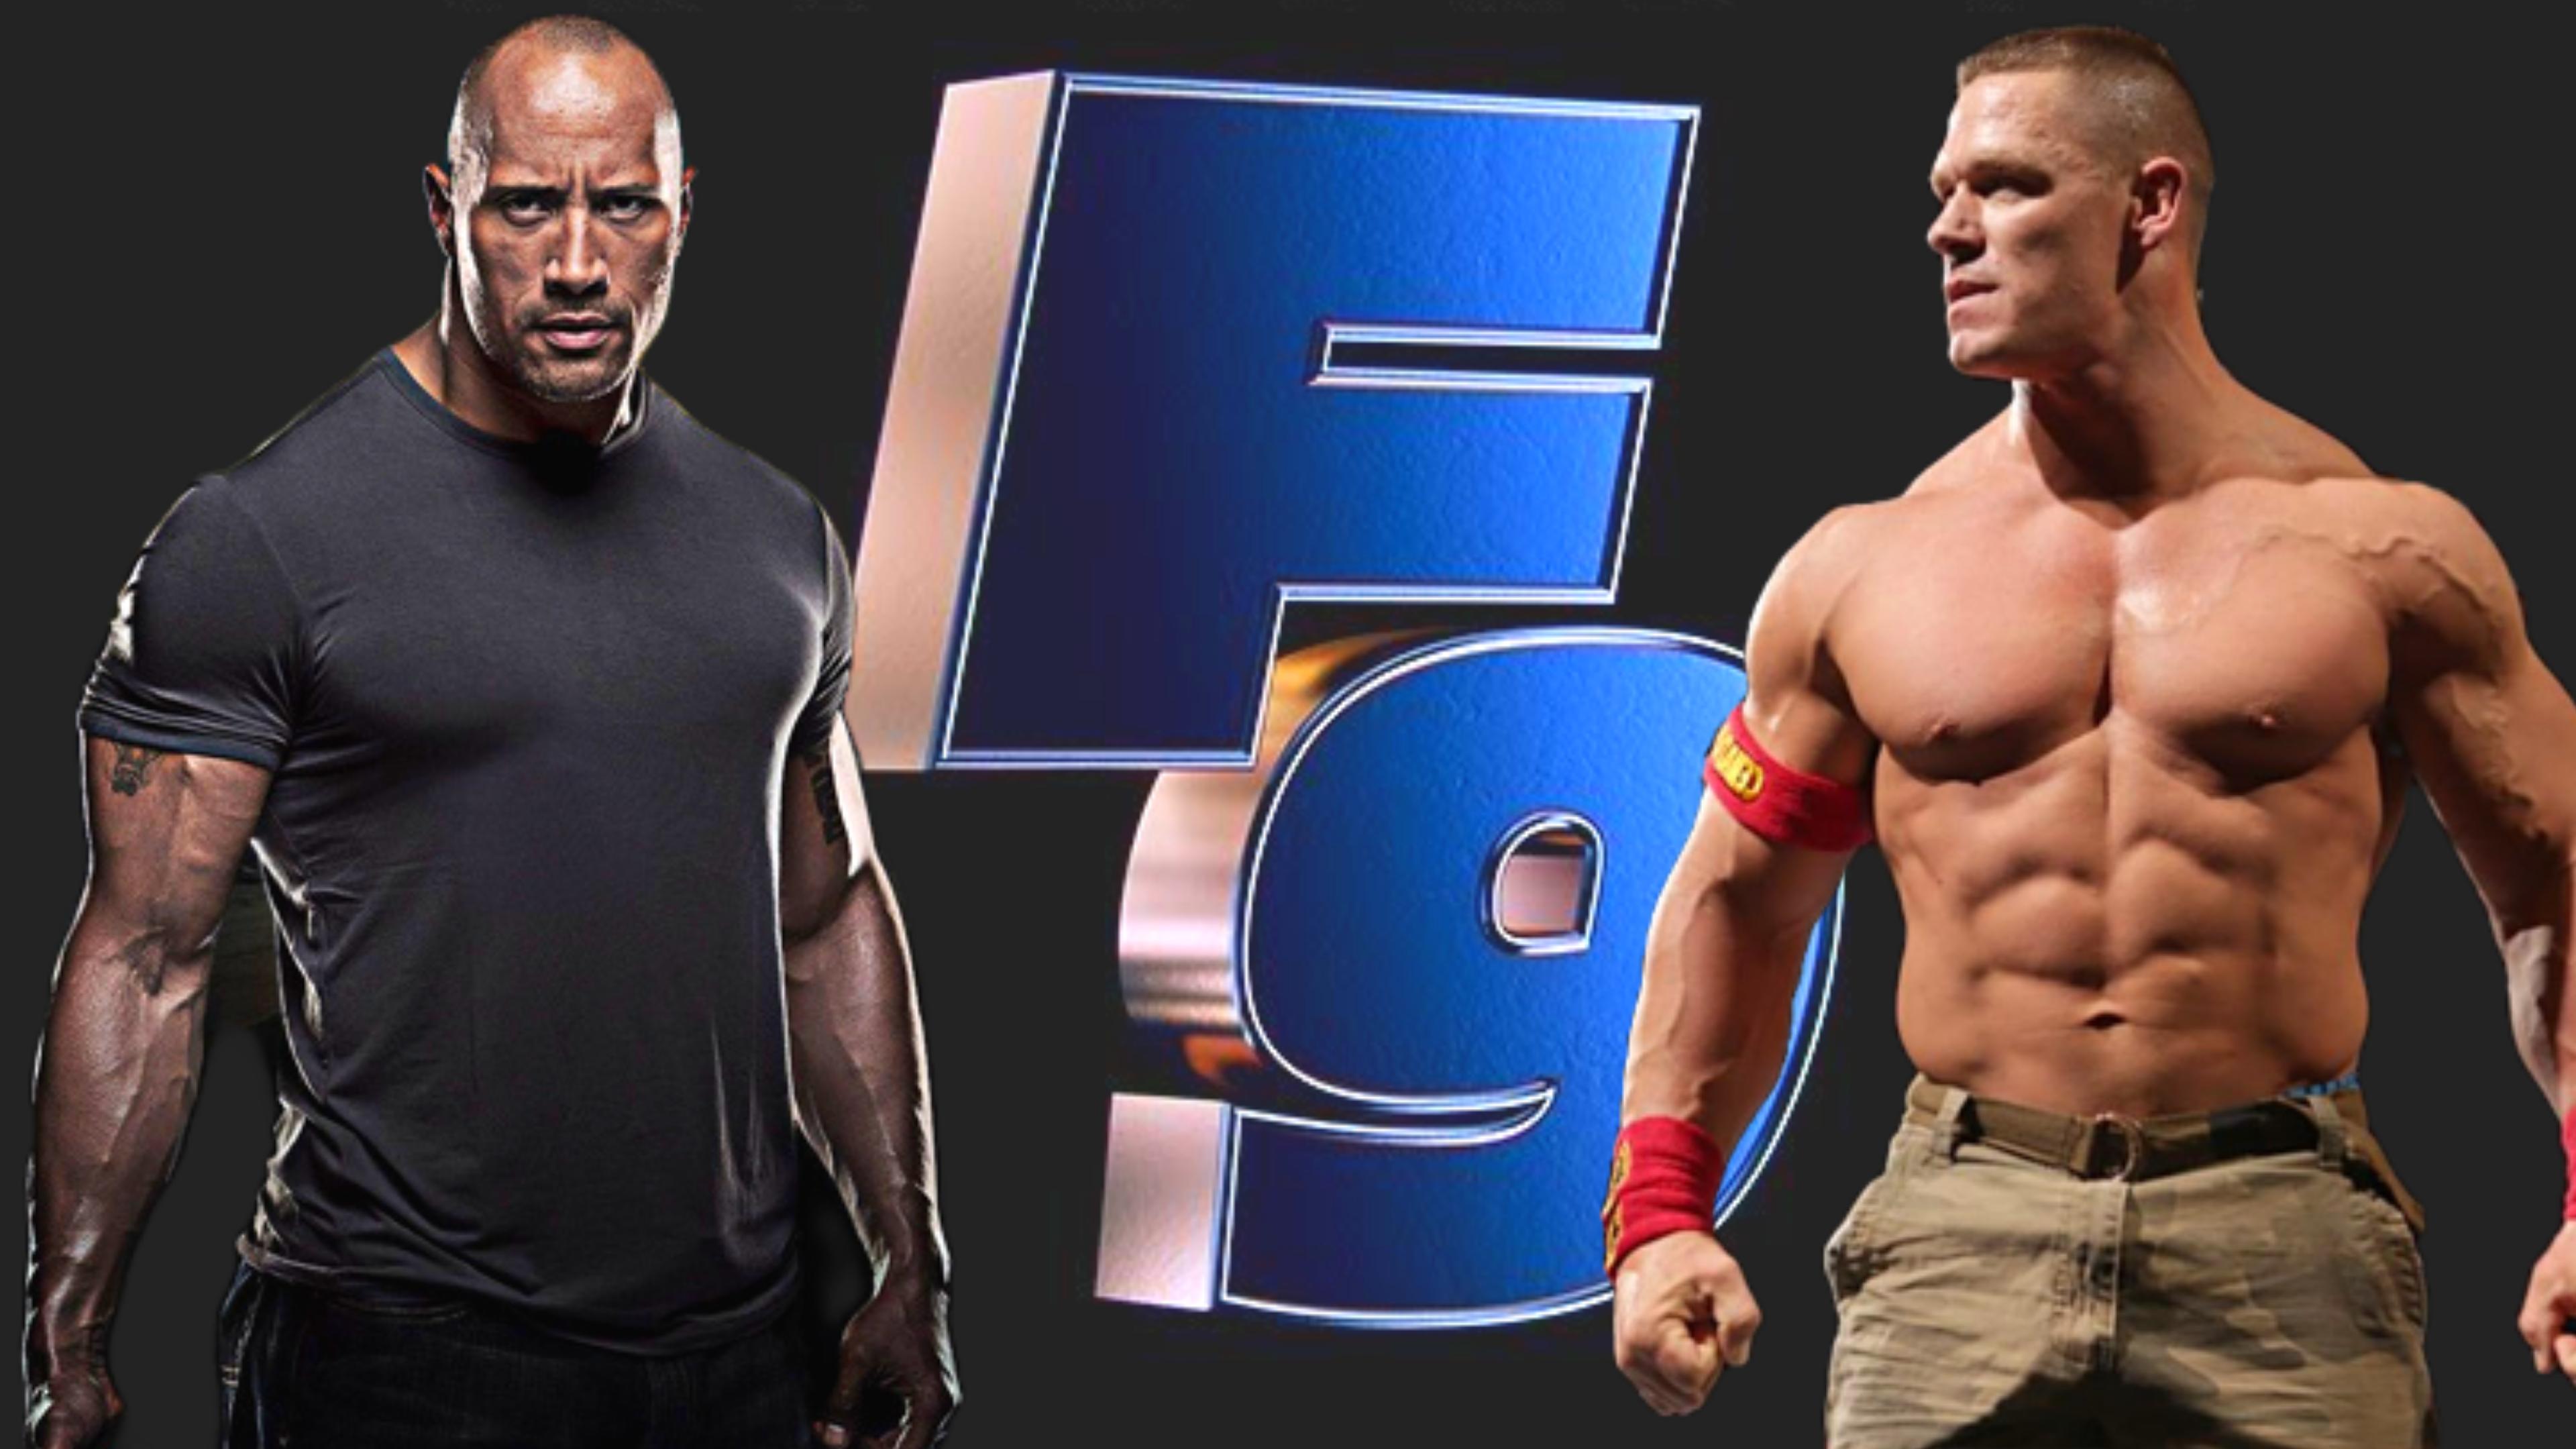 Fast Furious 9 Live Trailer Launch Event John Cena Dwayne Johnson Dwayne Johnson John Cena Dwanye Johnson